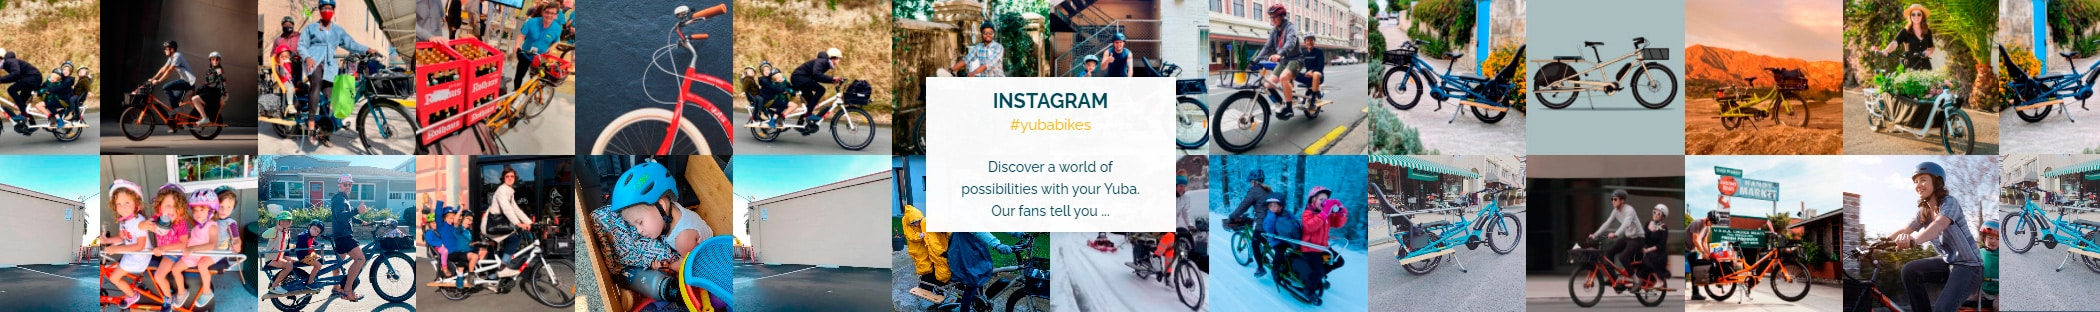 instagram yubabikes